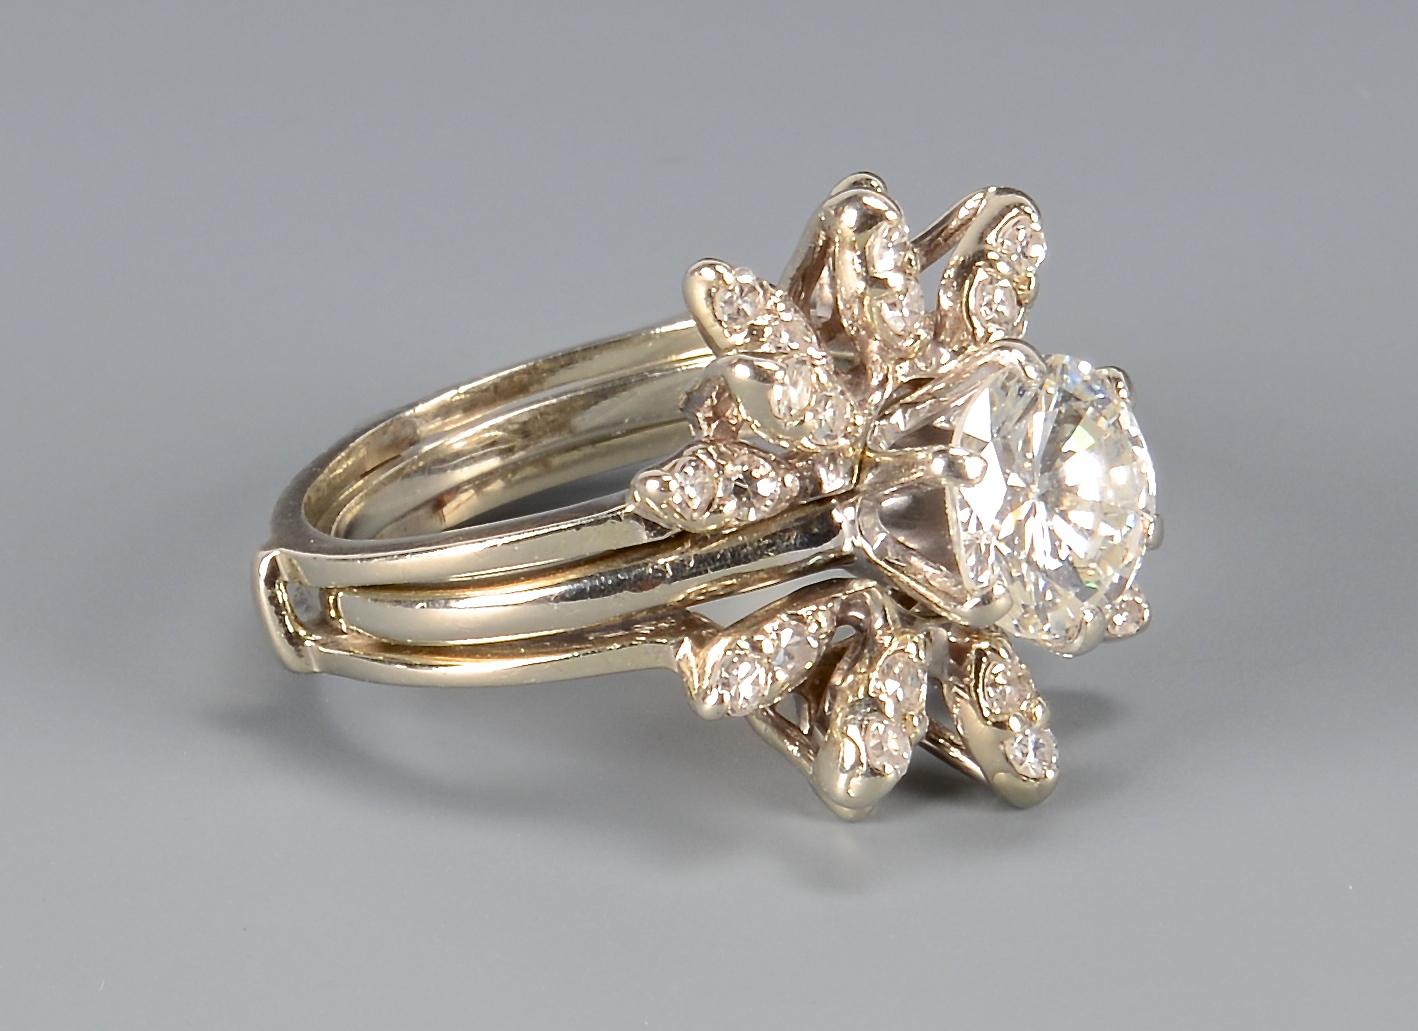 Lot 102: 2.02 Carat Diamond ring with guard